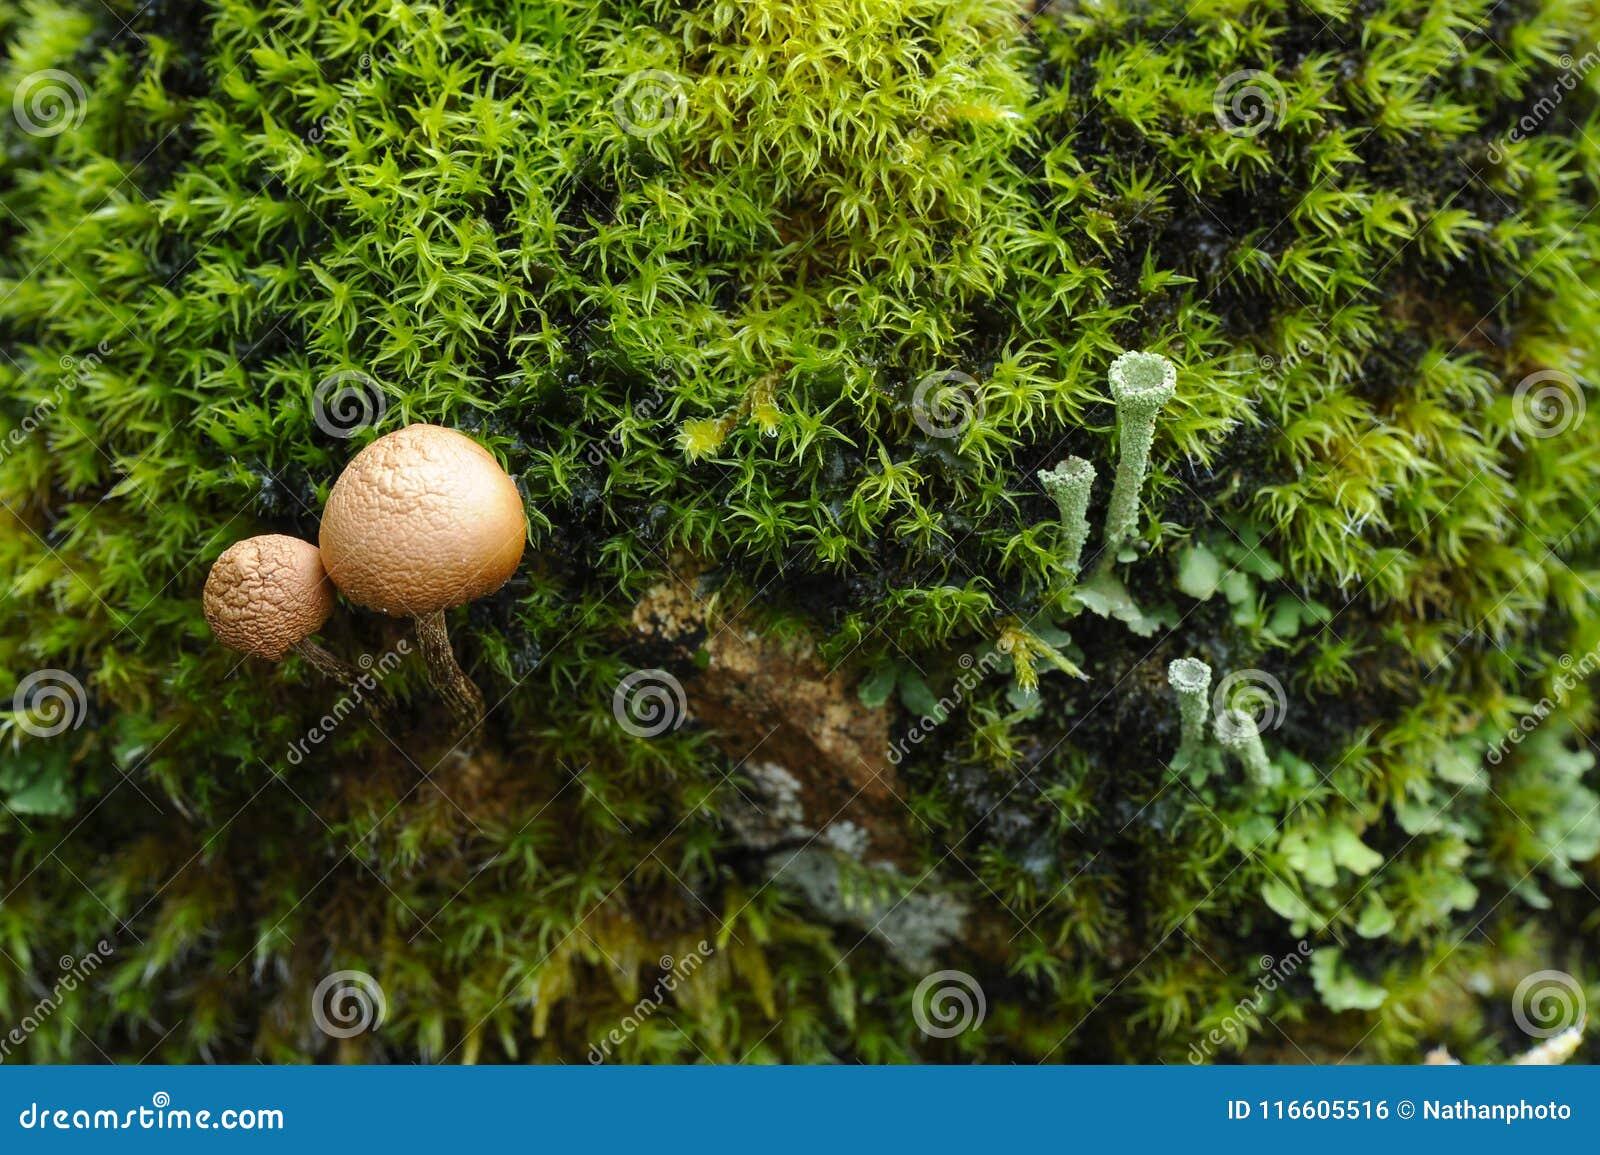 Miniature World Of Lichen, Moss And Mushrooms Stock Photo - Image of